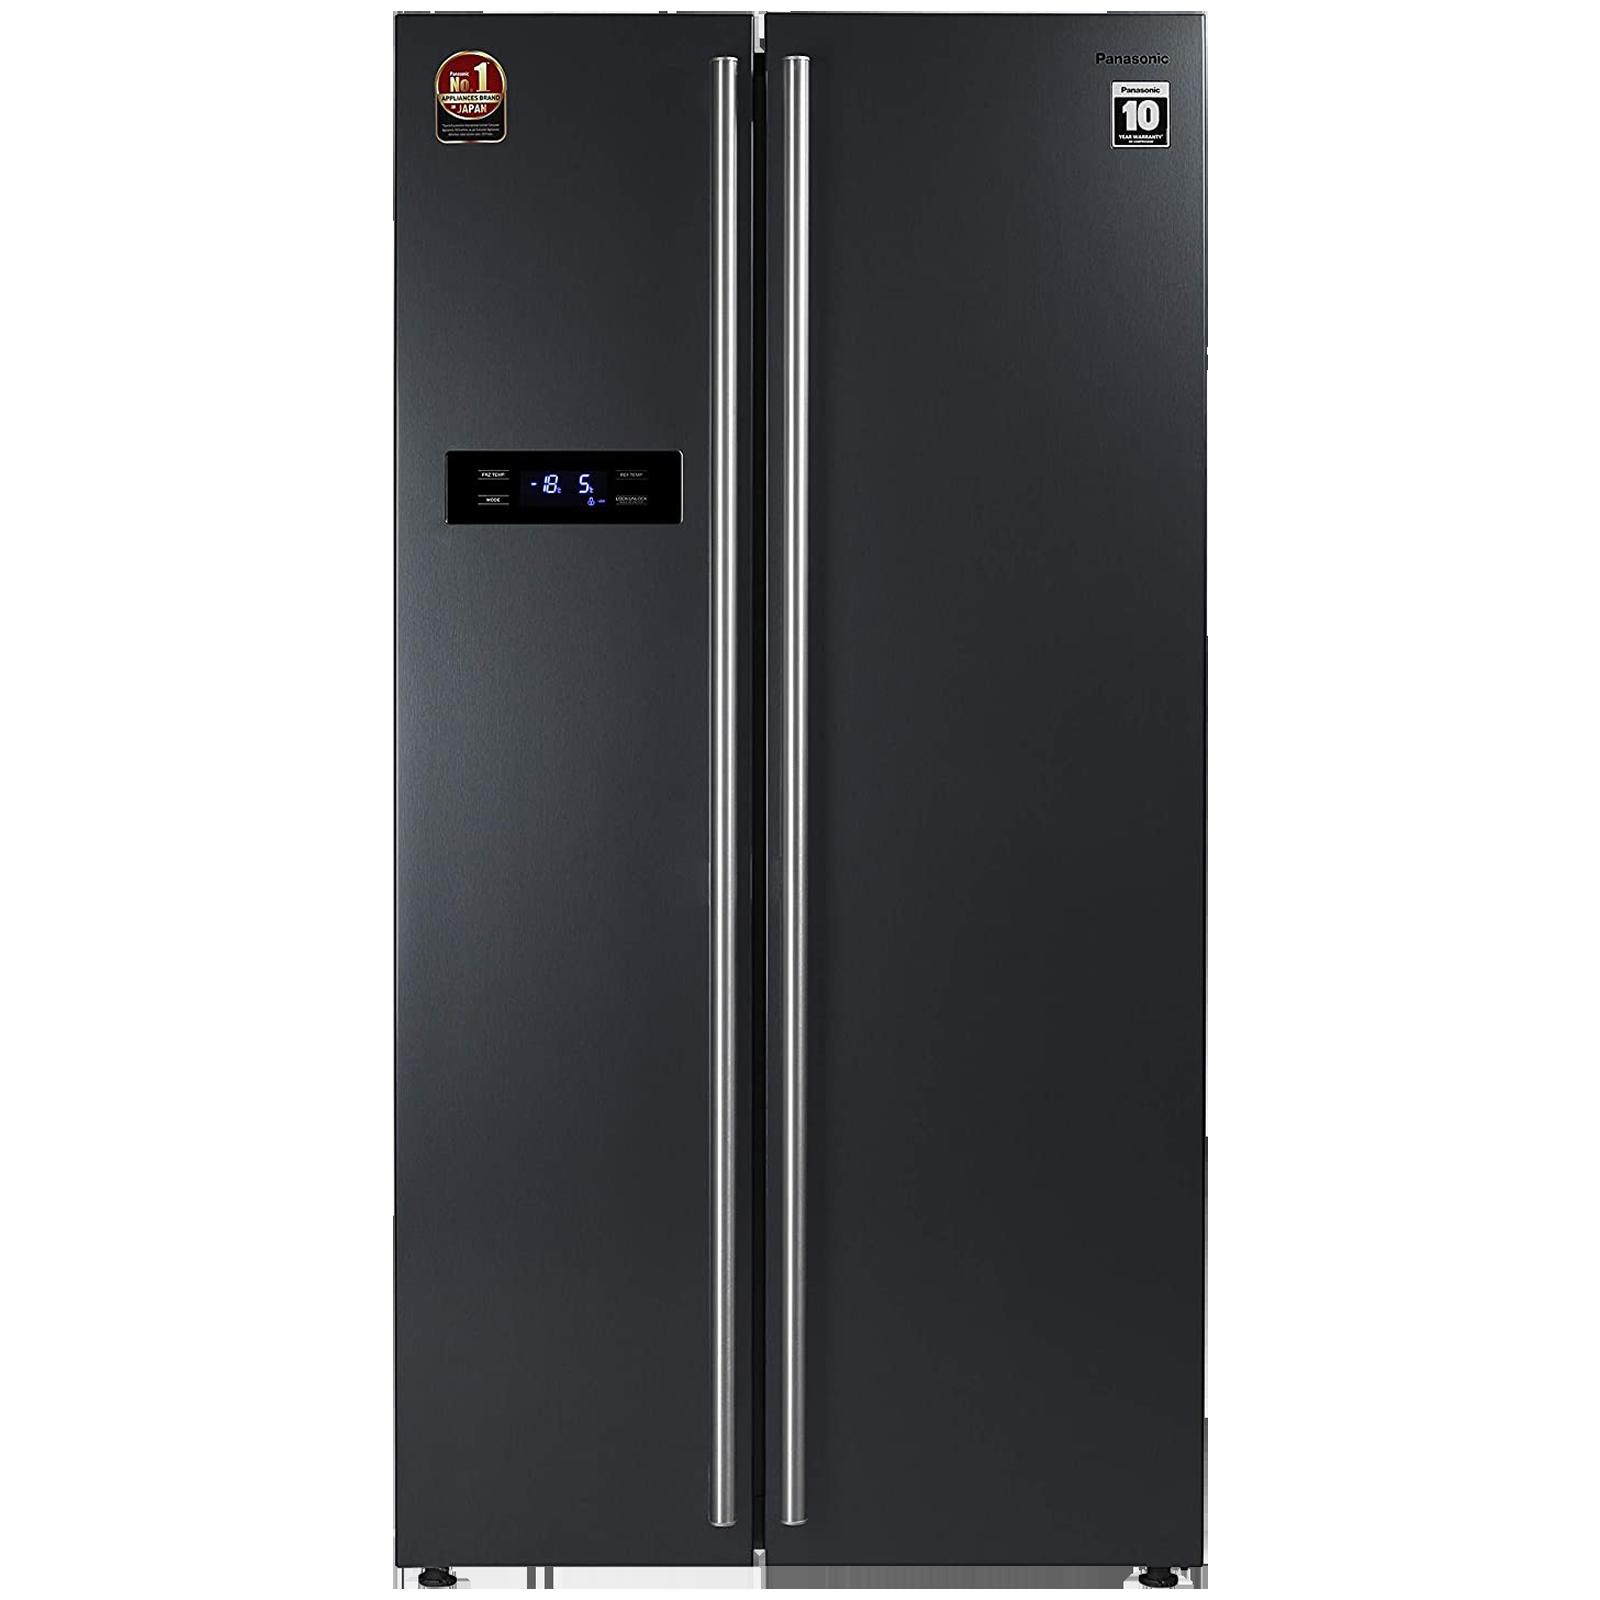 Panasonic 584 Litres Frost Free Intelligent Inverter Side-by-Side Refrigerator (Quick Freeze Mode, NR-BS60VKX1, Dark Grey Steel)_1